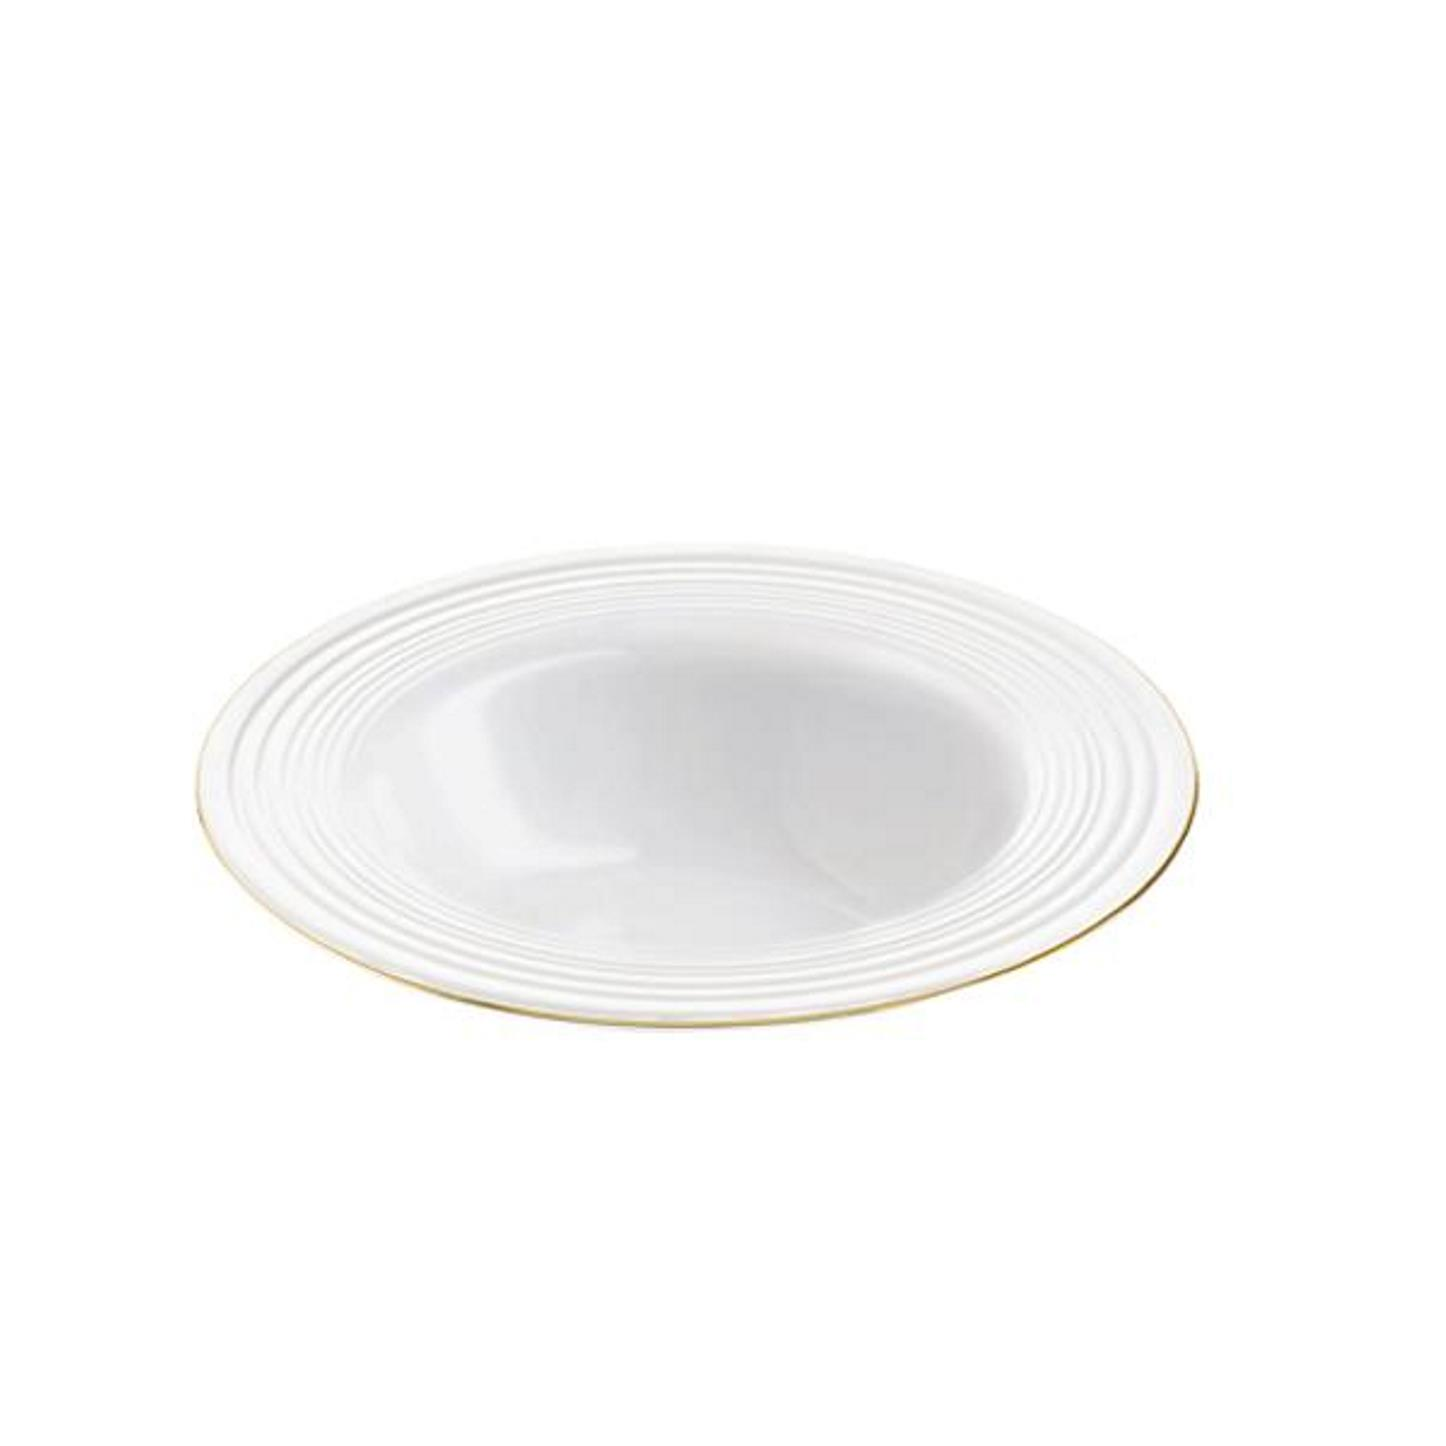 Онлайн каталог PROMENU: Тарелка глубокая Aida PASSION, диаметр 23 см, белый с золотистой каймой                               19474